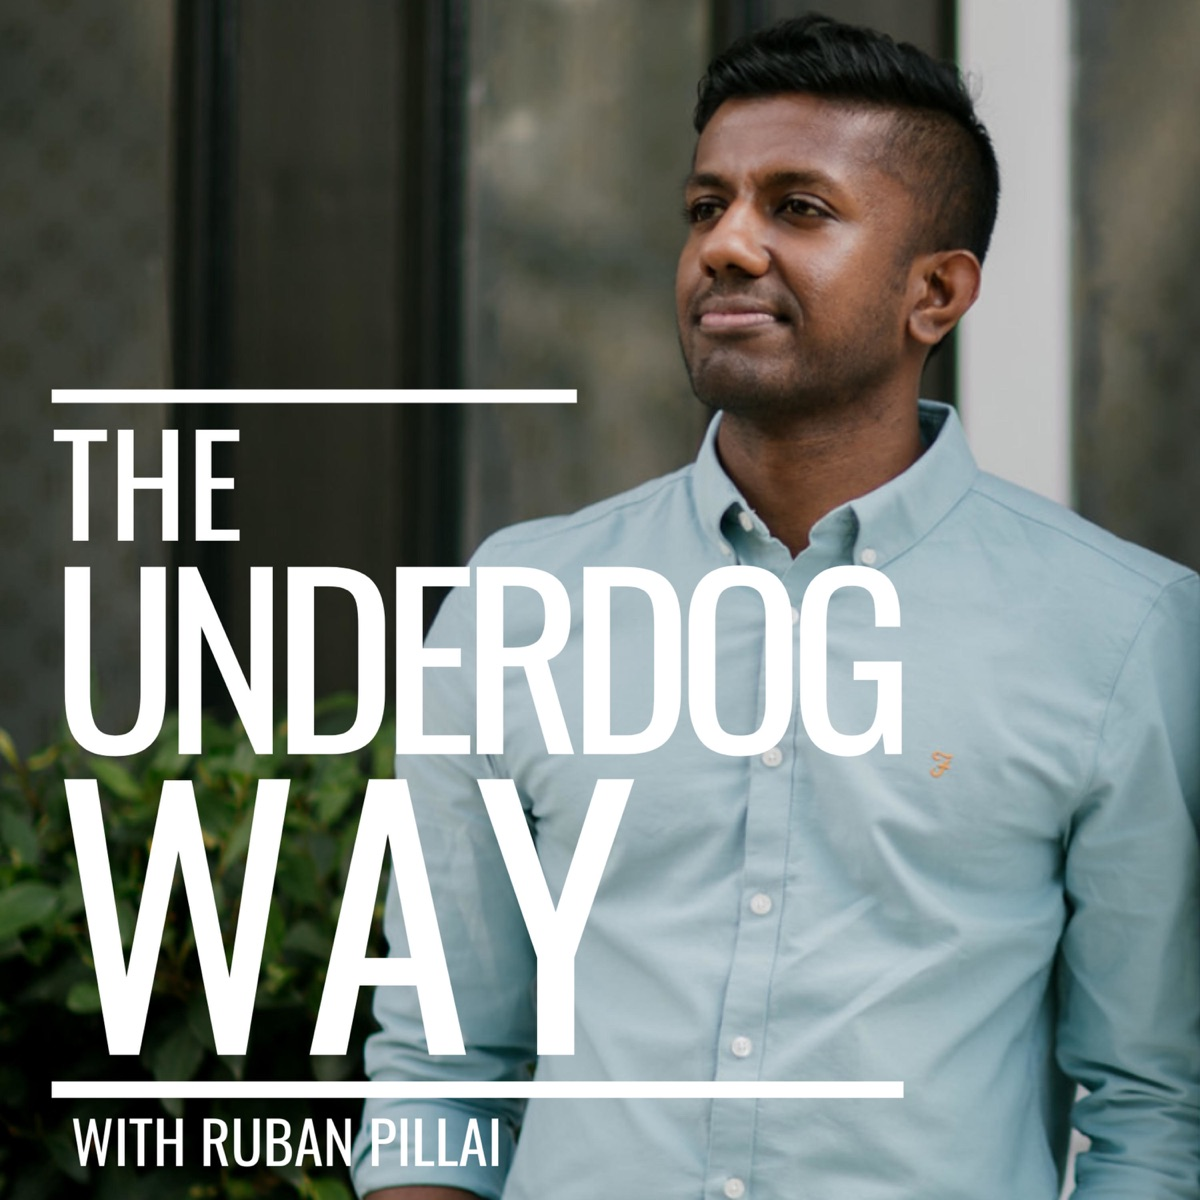 The Underdog Way with Ruban Pillai